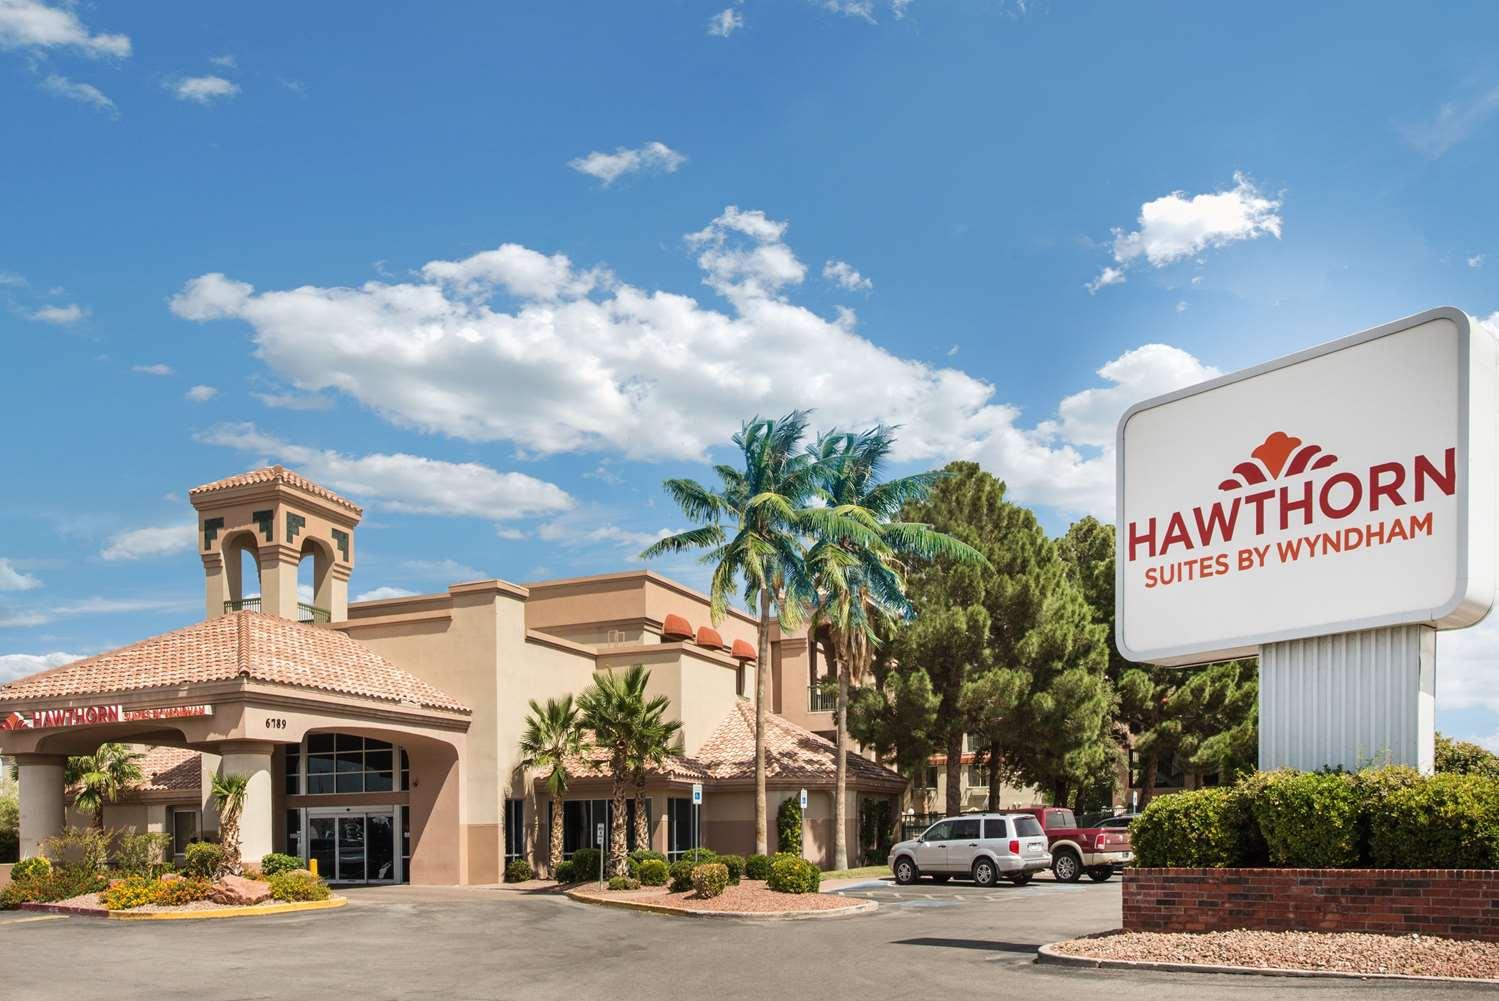 Exterior view - Hawthorn Suites by Wyndham Airport El Paso